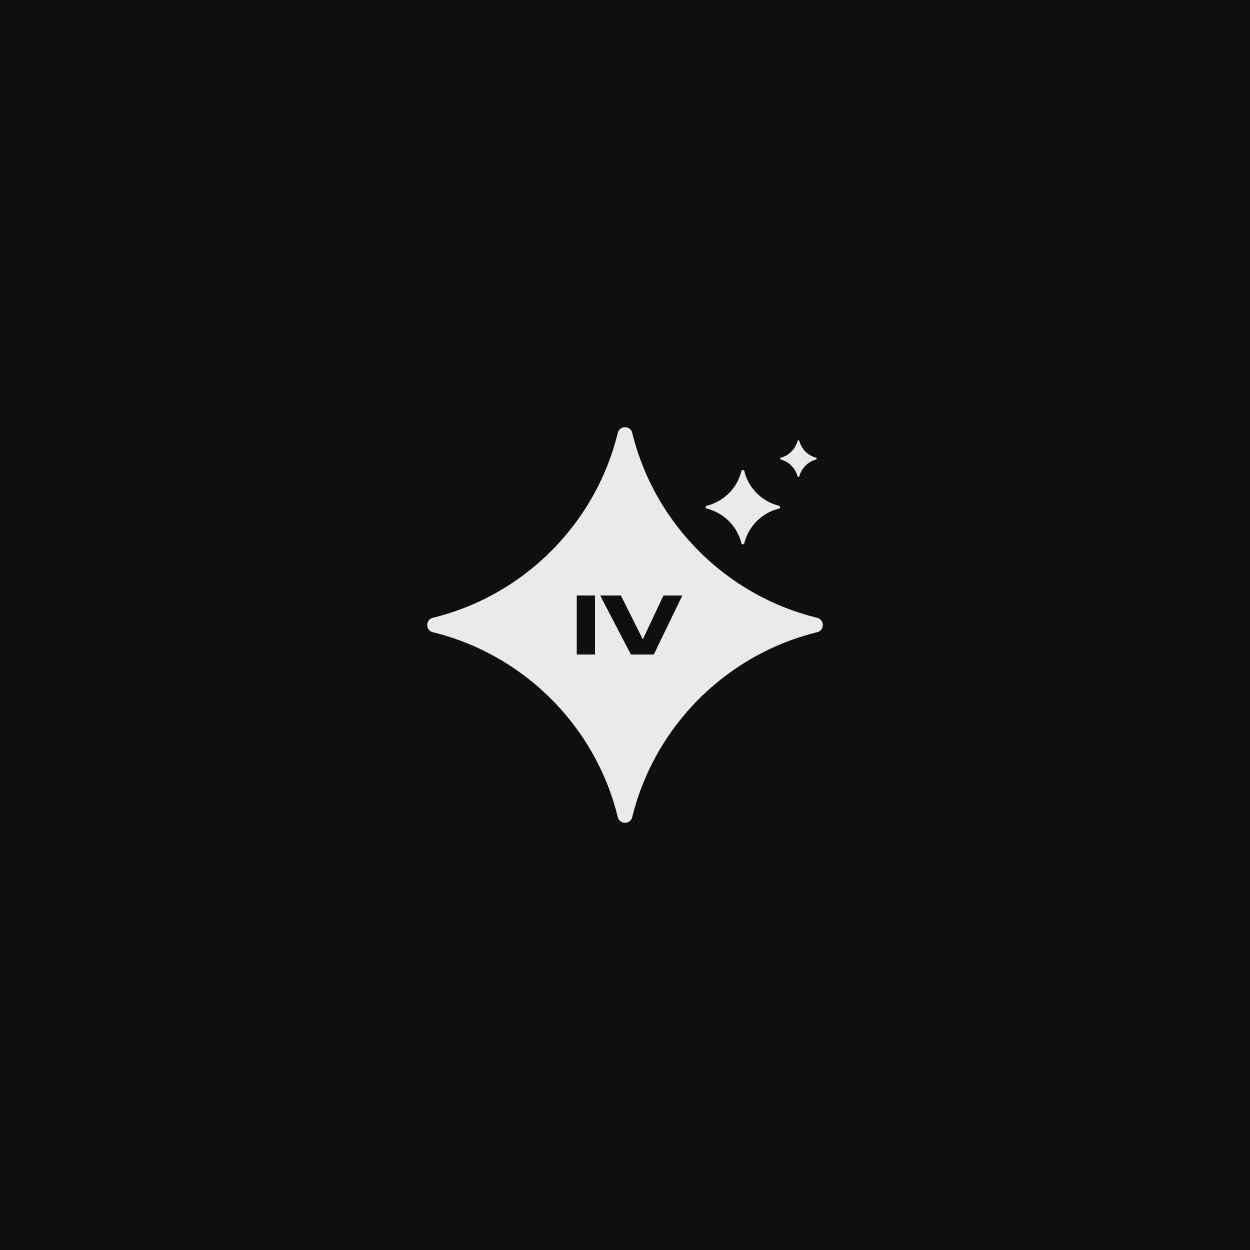 Sylvan_Logofolio2019_Artboard 131 copy1250.jpg